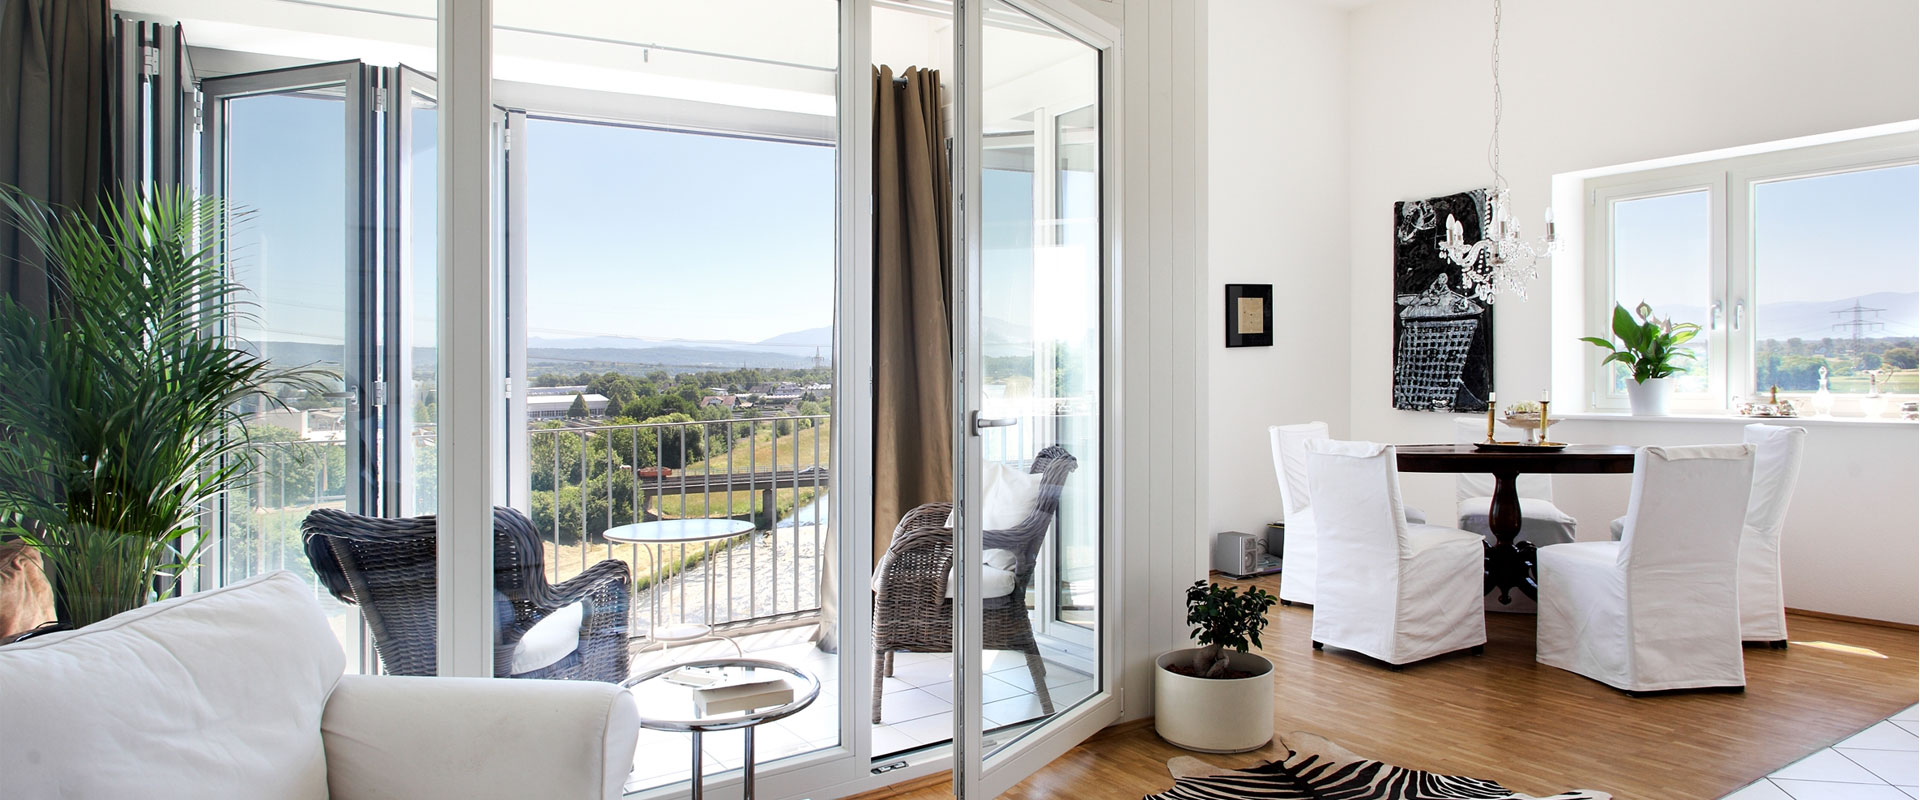 holz fenster kneer s dfenster fenster und haust ren f r generationen. Black Bedroom Furniture Sets. Home Design Ideas